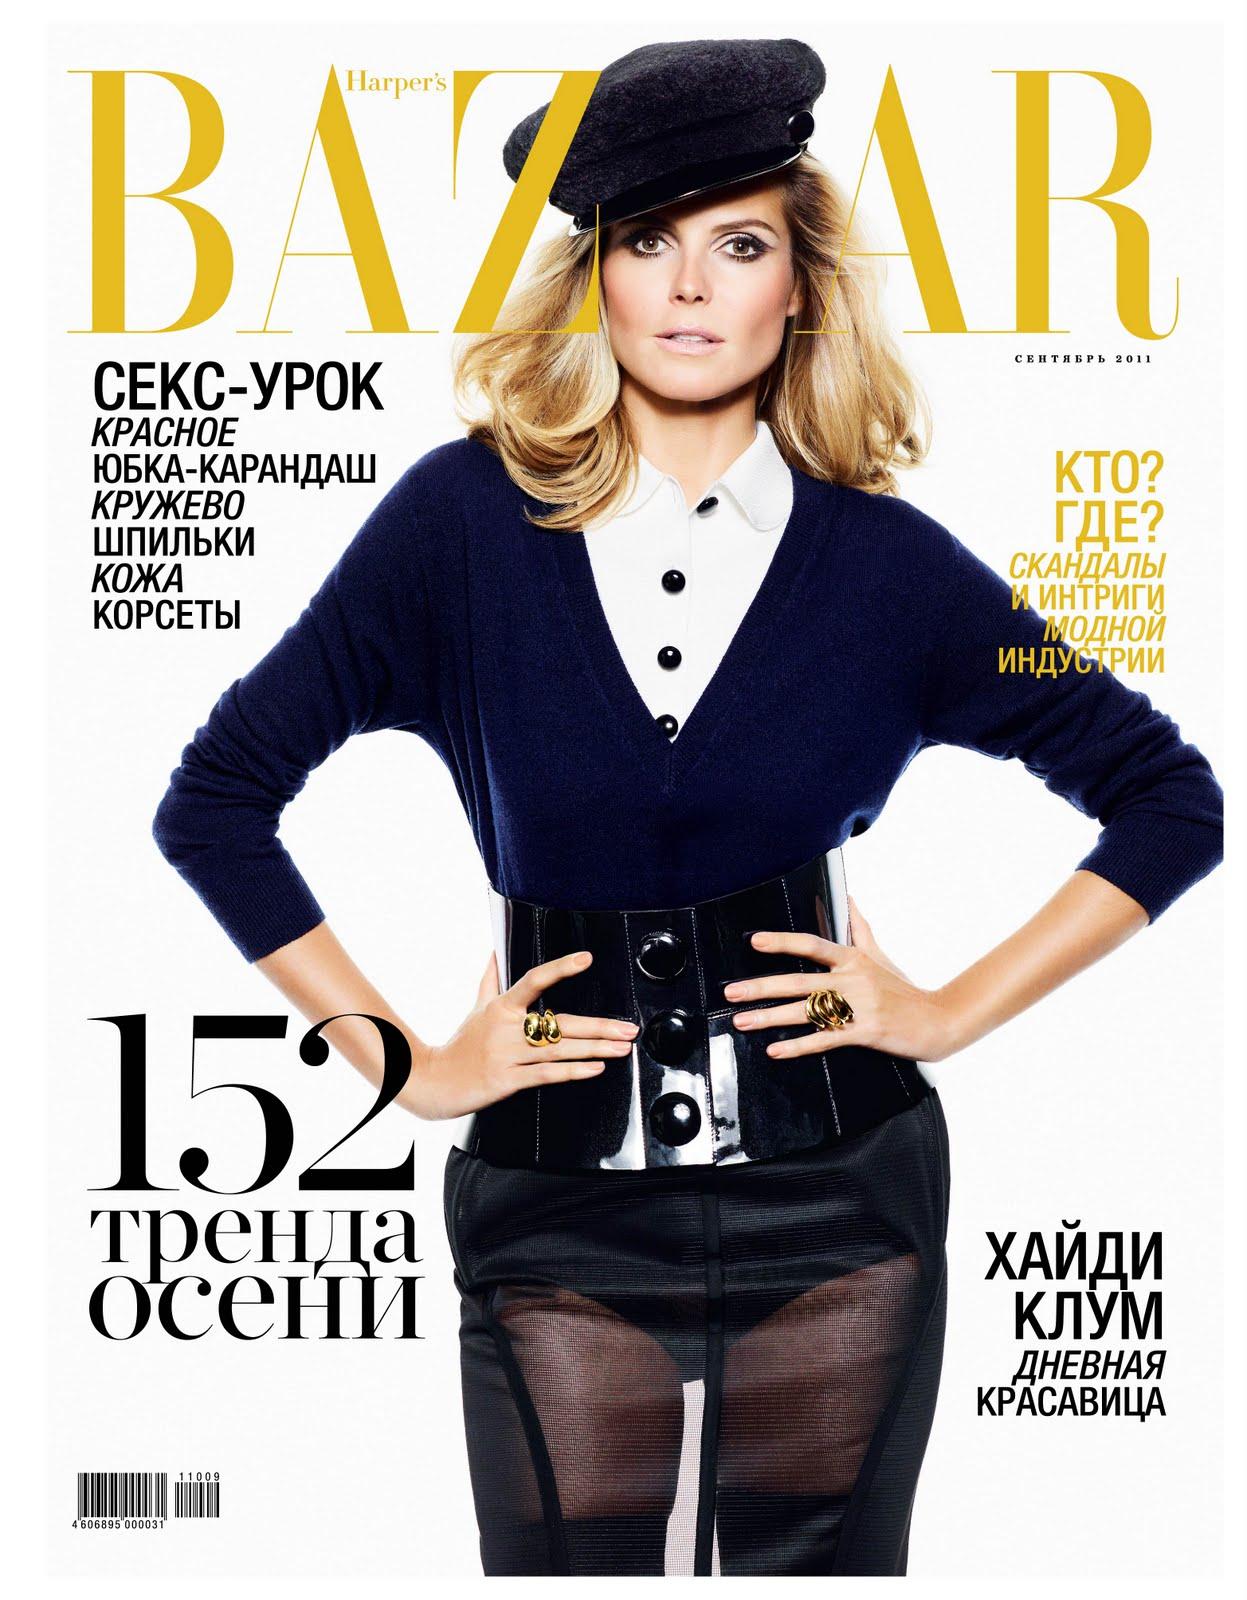 http://2.bp.blogspot.com/-9aRwPArAt5c/TkyDRAevcFI/AAAAAAAASpQ/4-Ae79DWBUY/s1600/heidi-klum-russia-harpers-bazaar-september-2011-%2Bvuitton.jpg